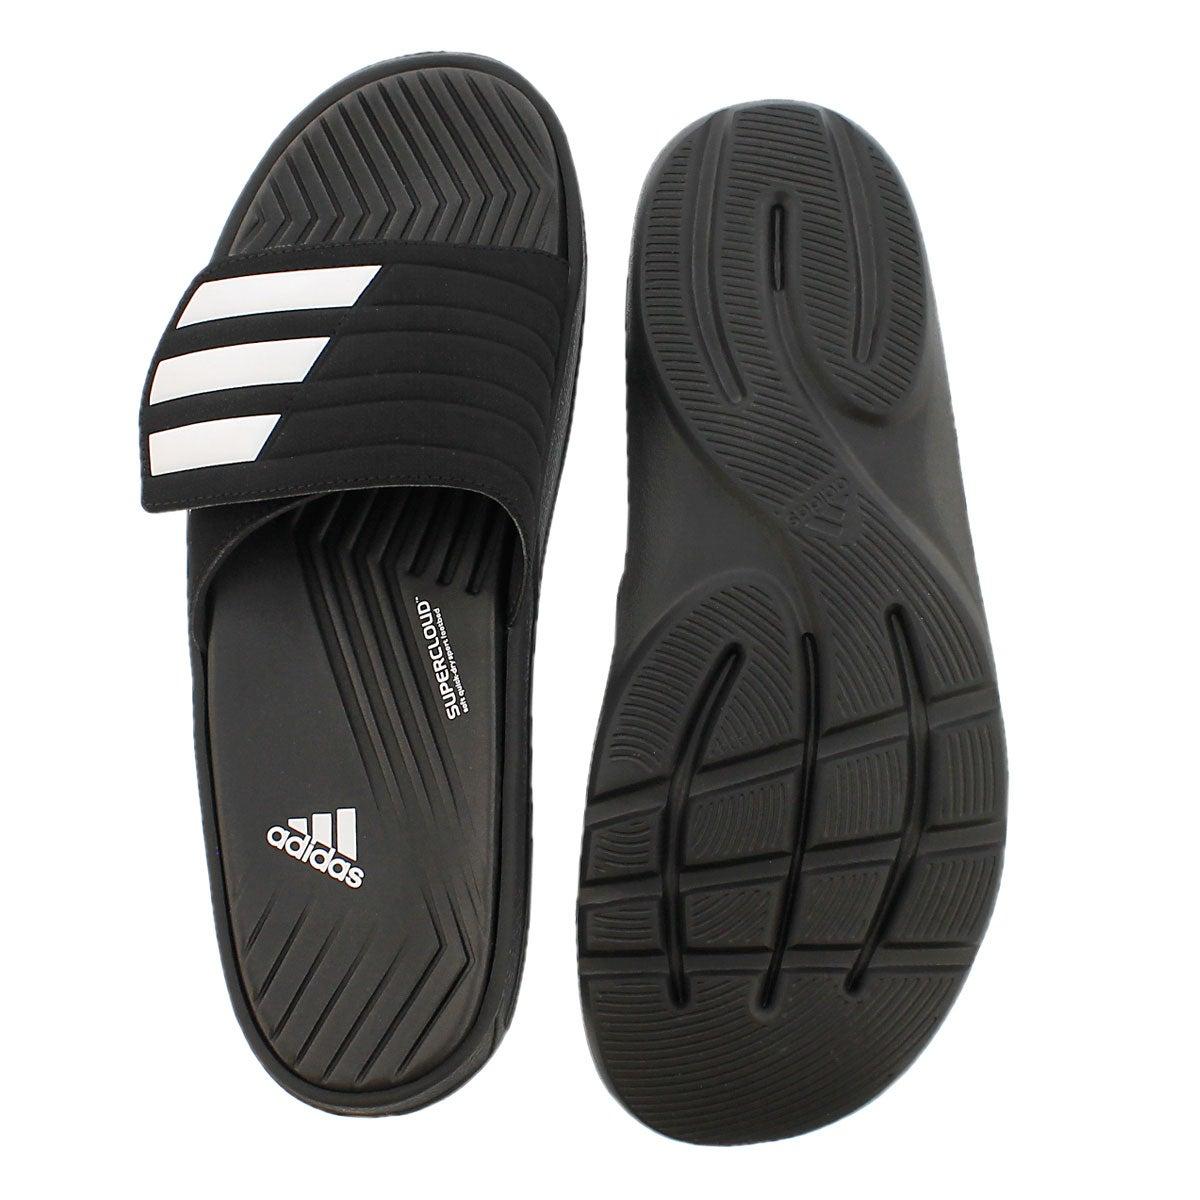 Mns Izamo black/white slide sandal